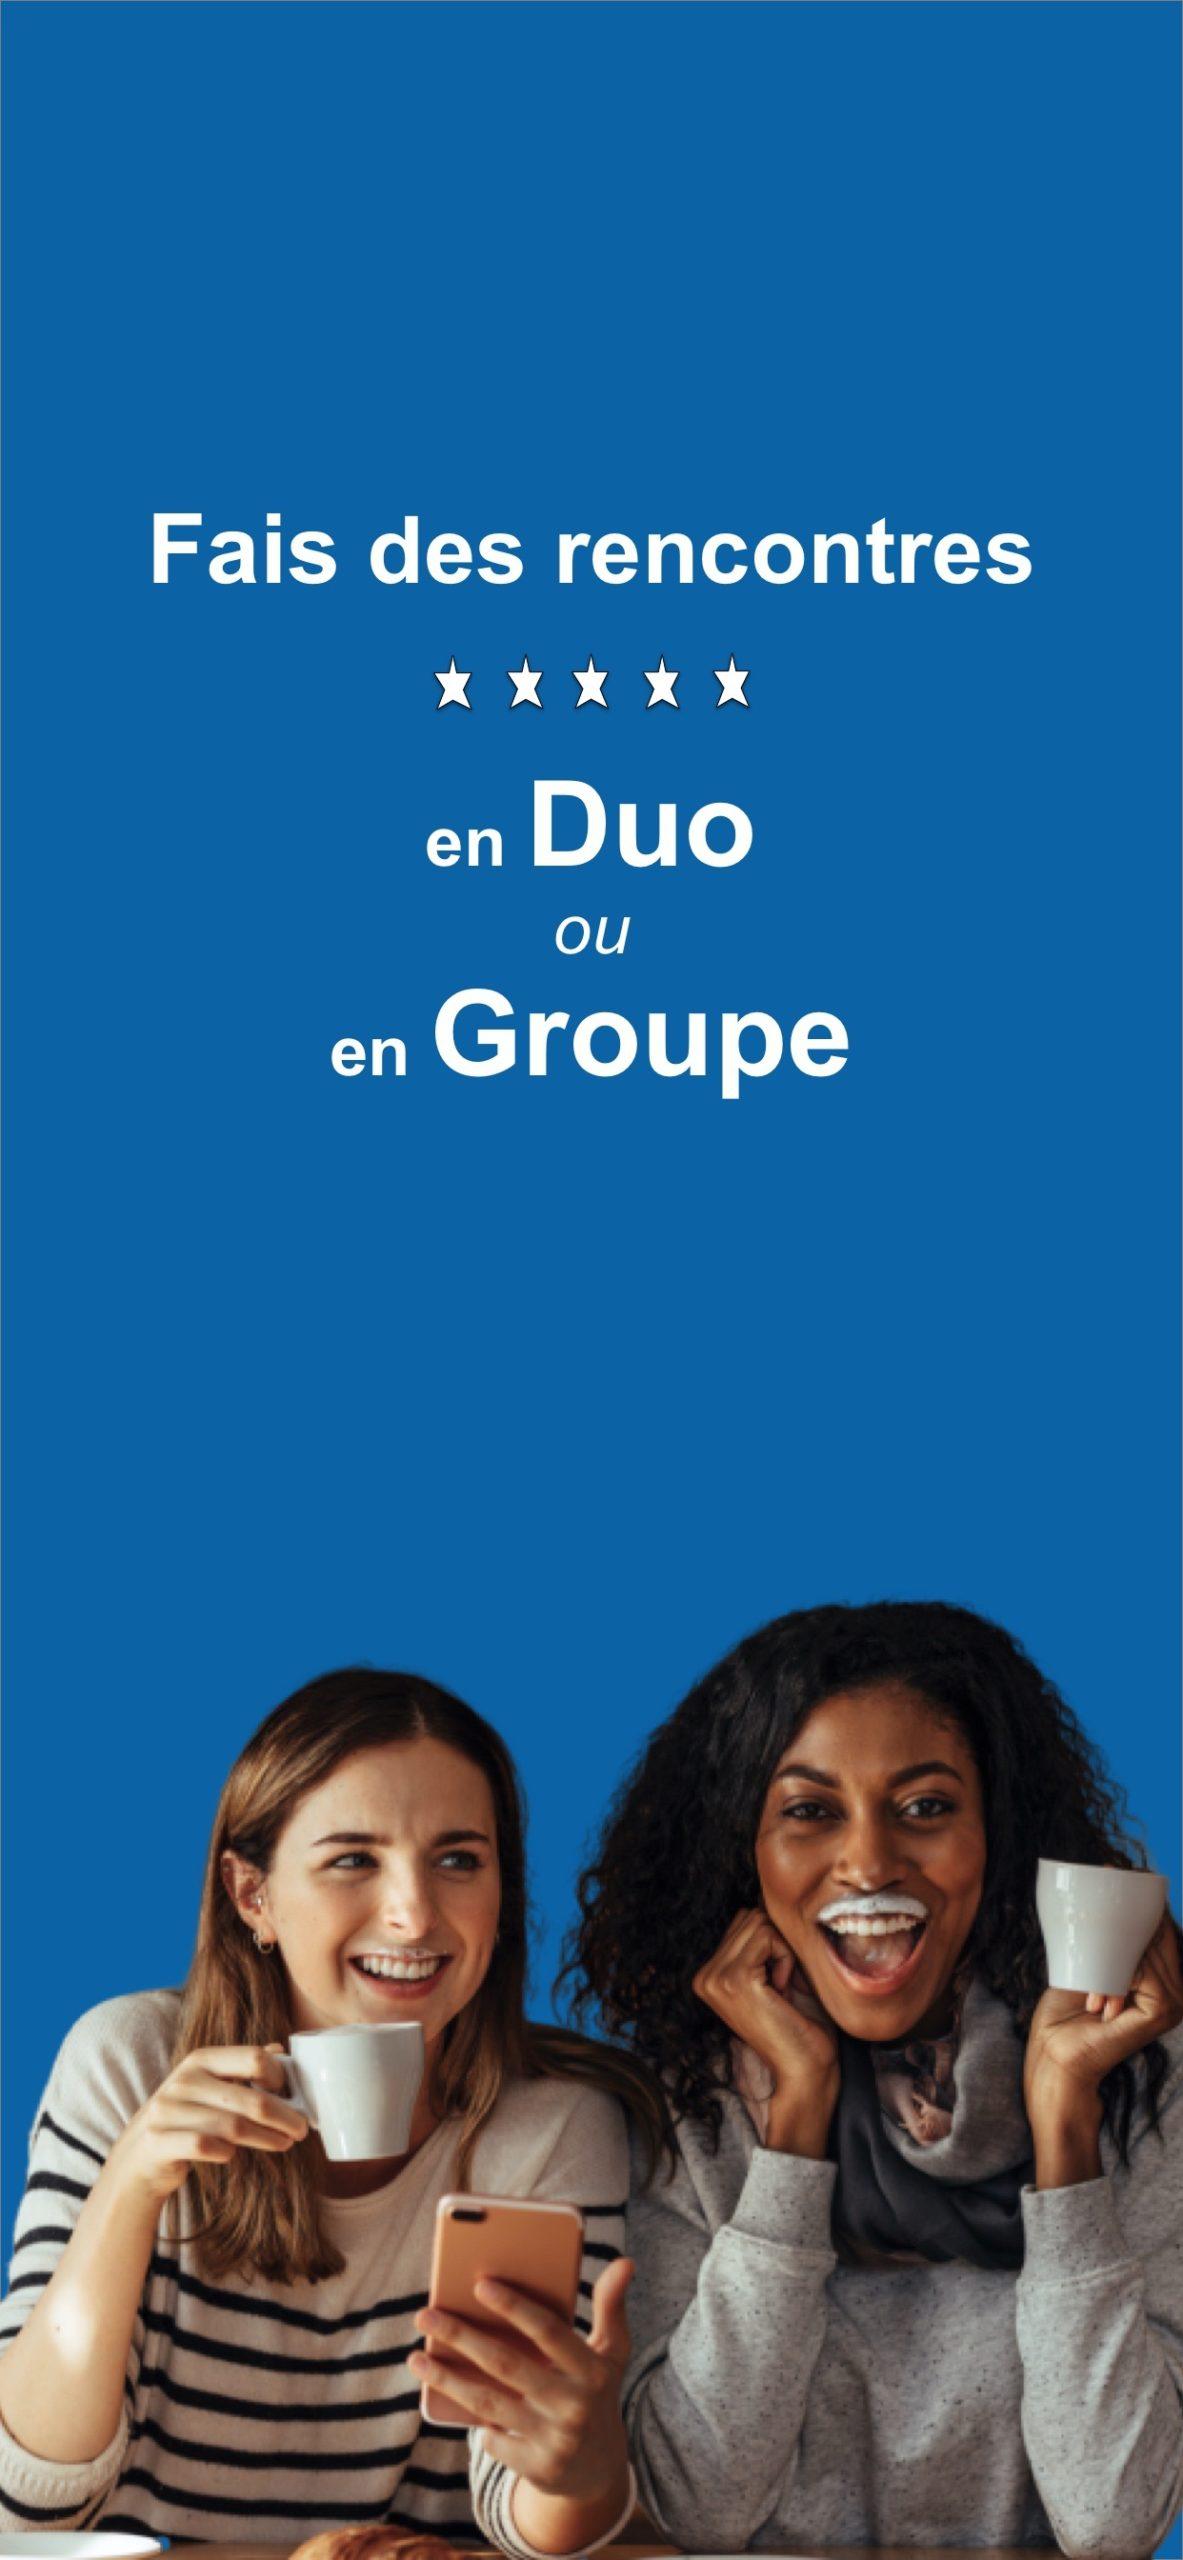 application-iphone-ios-apple-elyot-developpeur-freelance-bordeaux-1